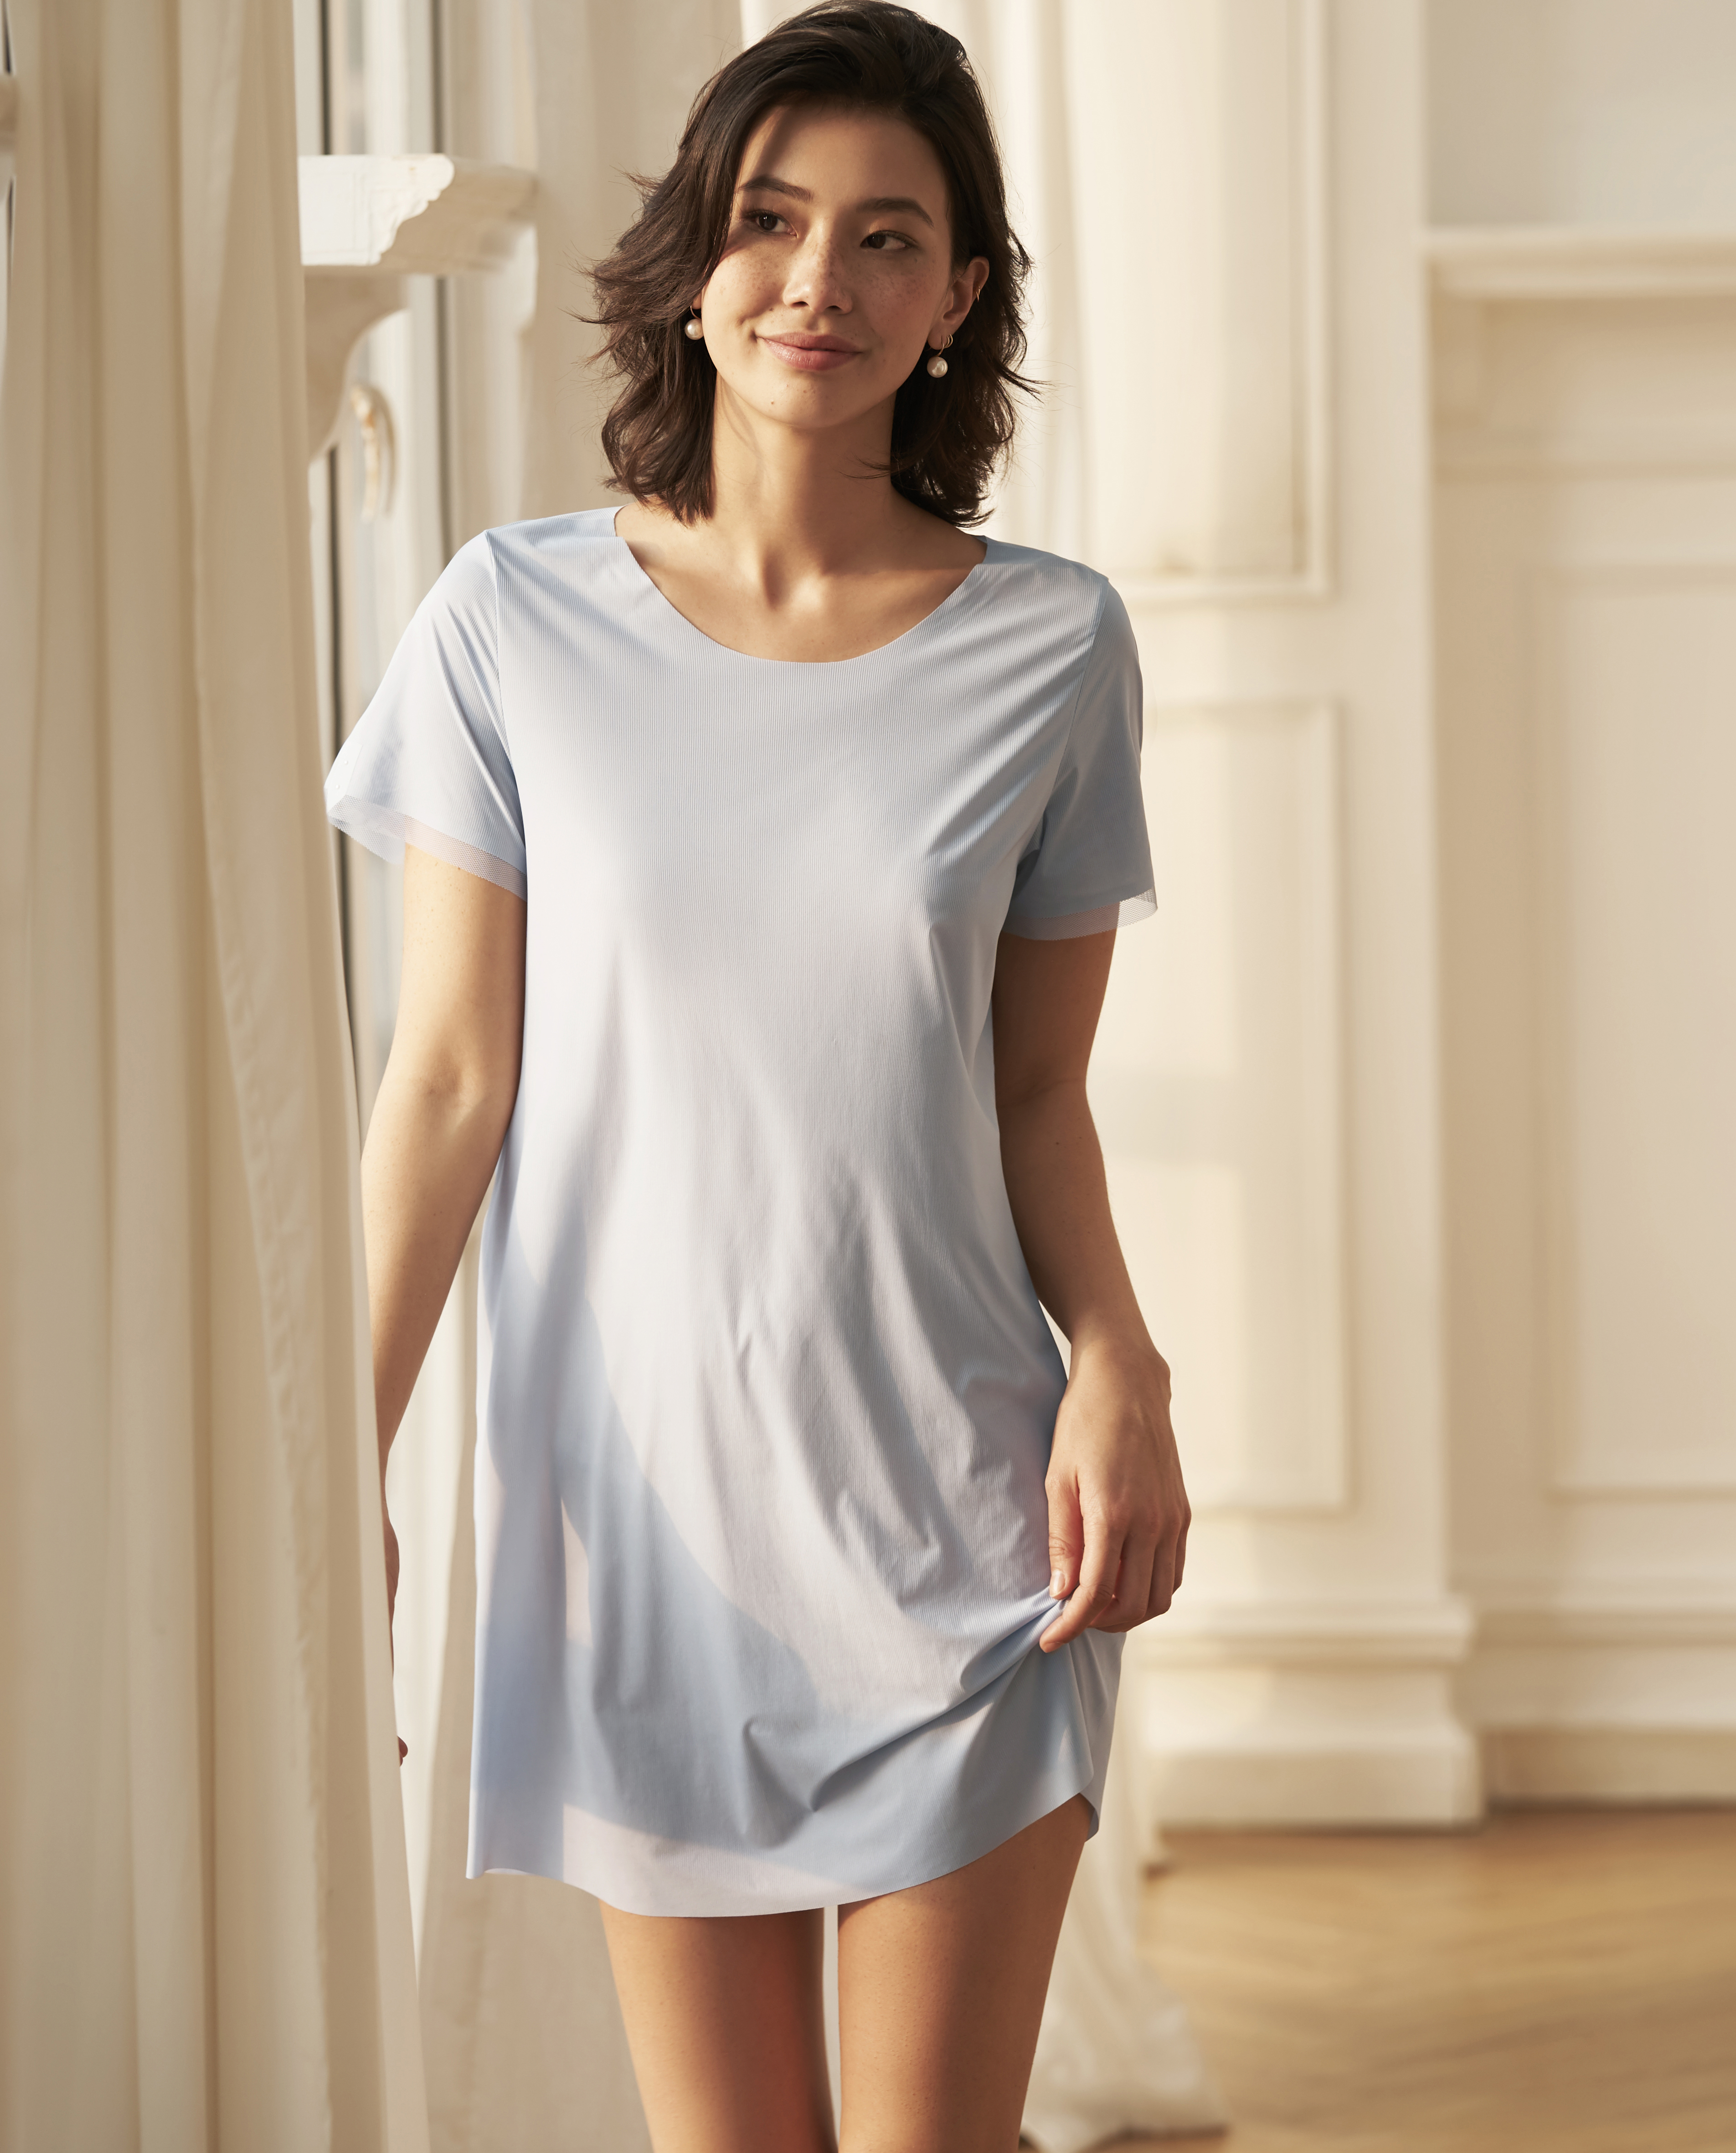 Aimer睡衣|愛慕金沙海岸短袖睡裙AM442491